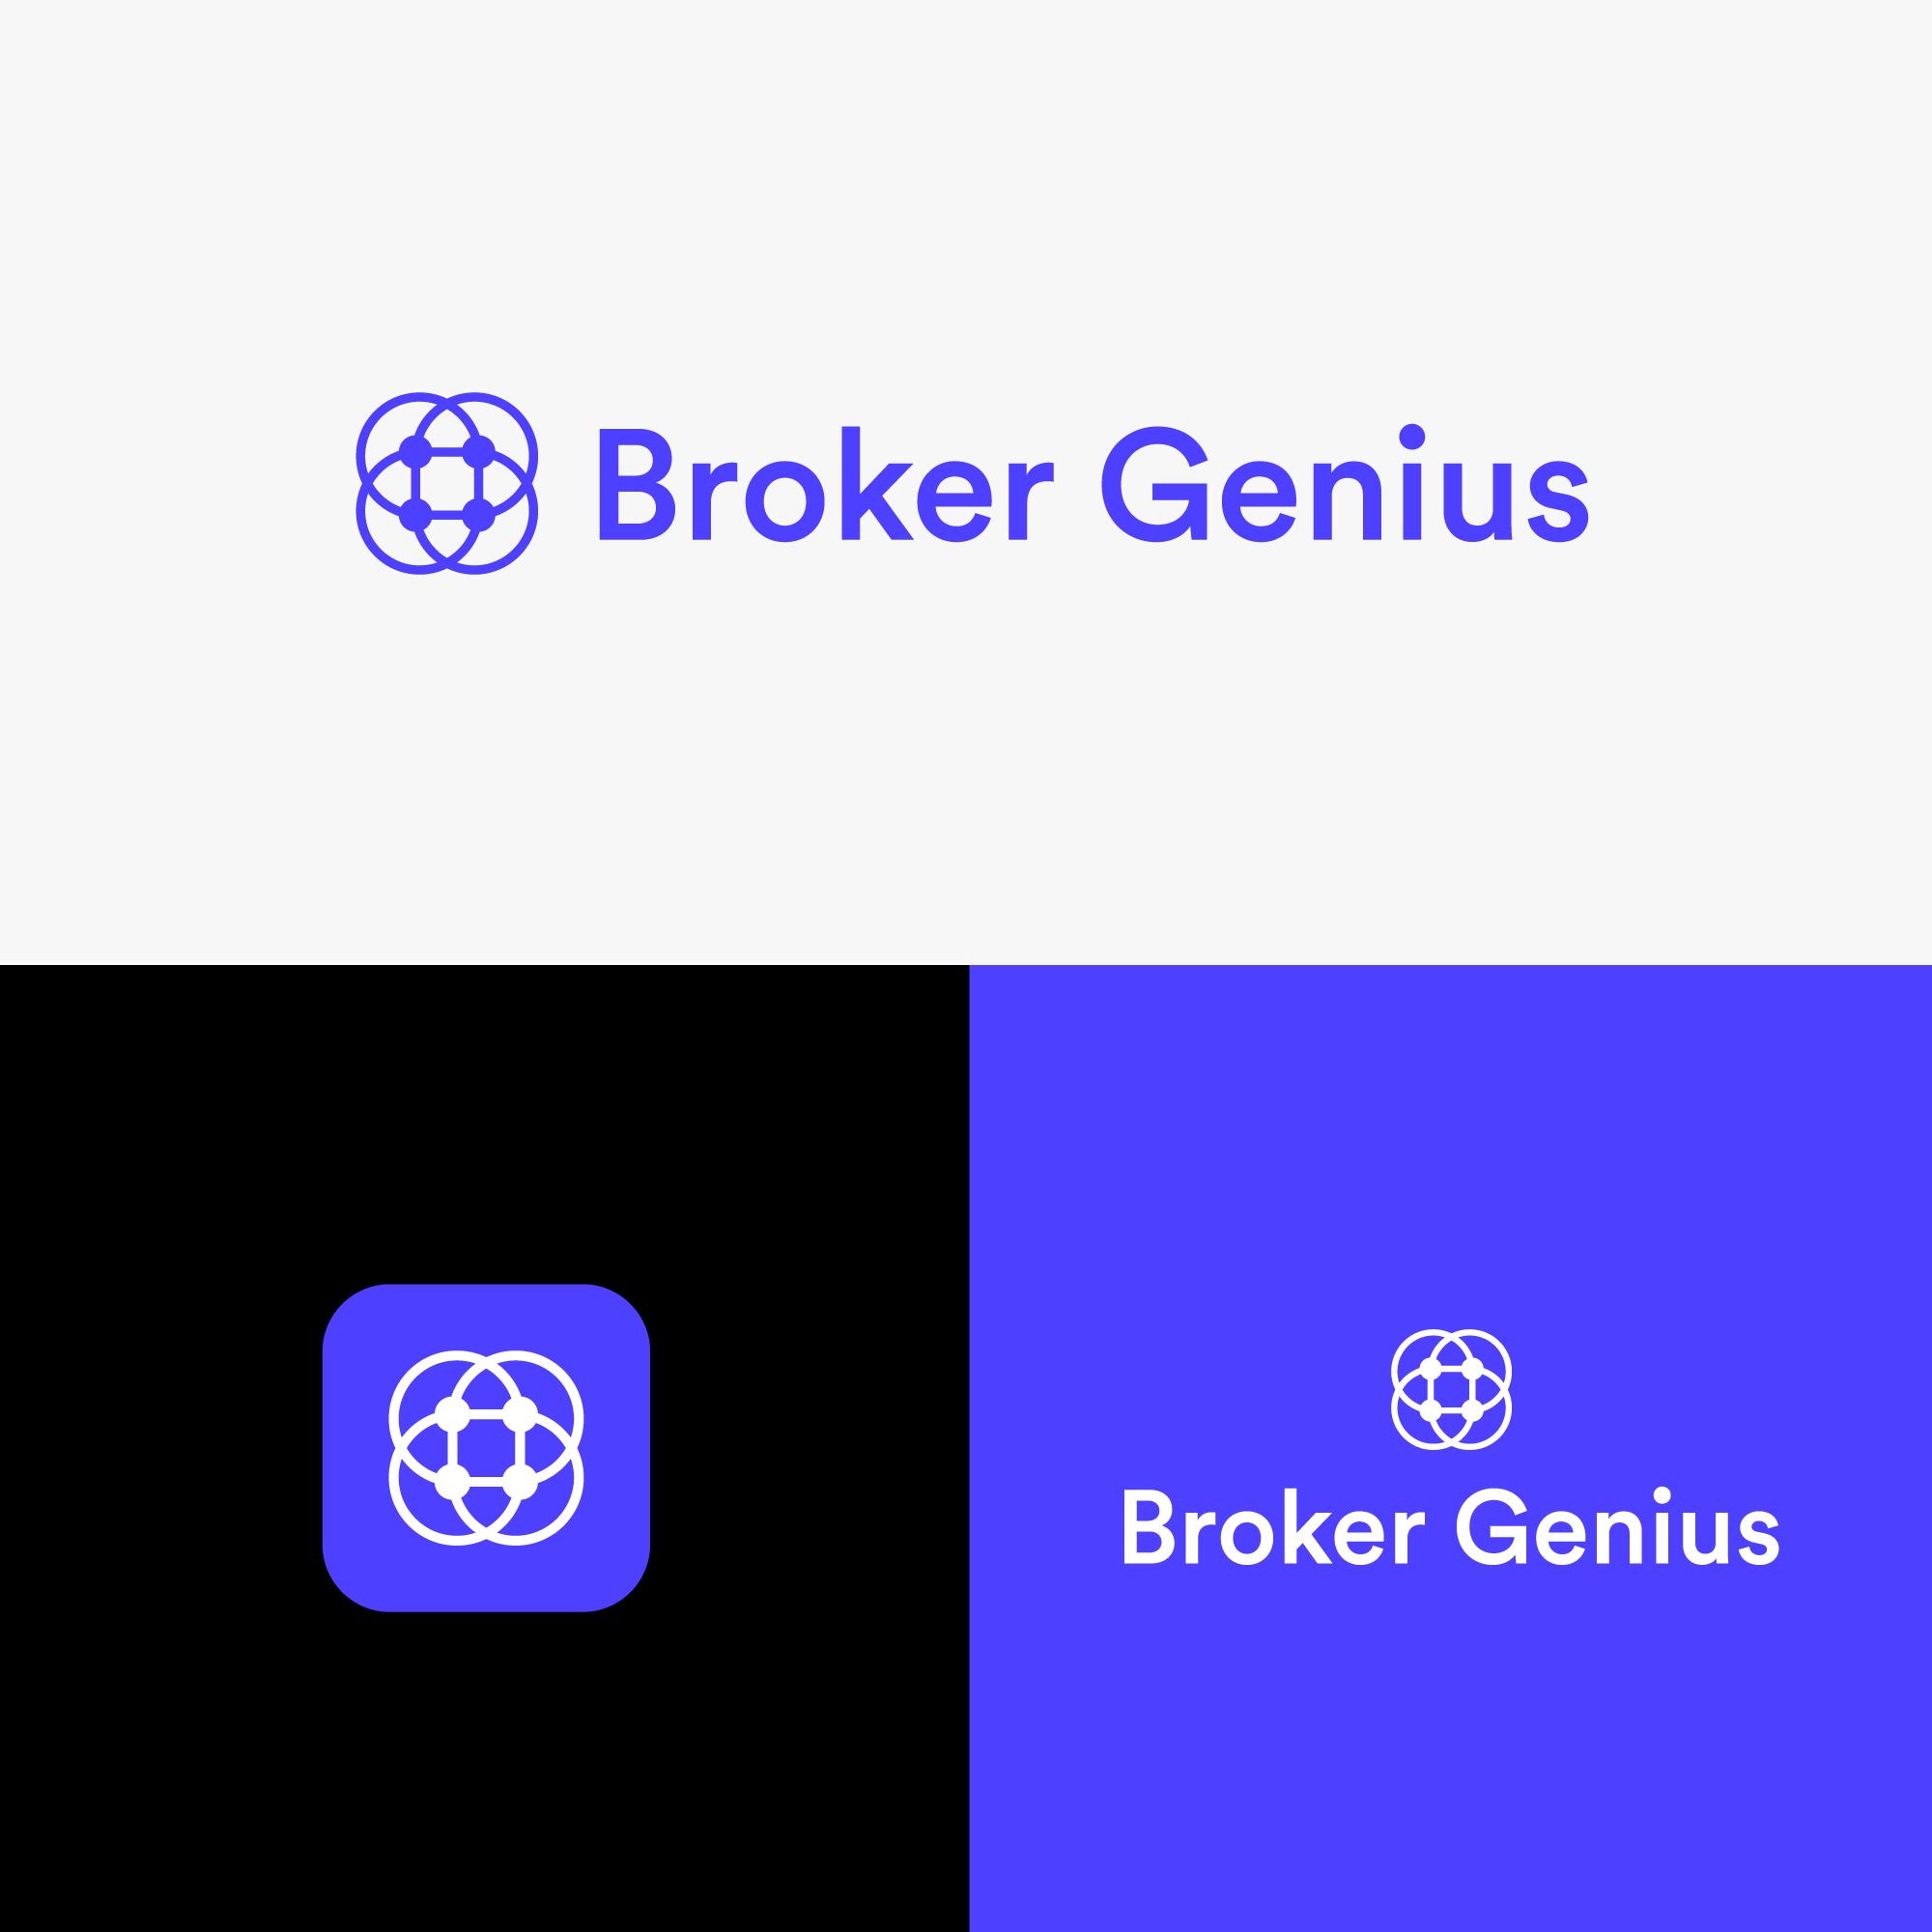 Broker-Genius-Logos-960x960